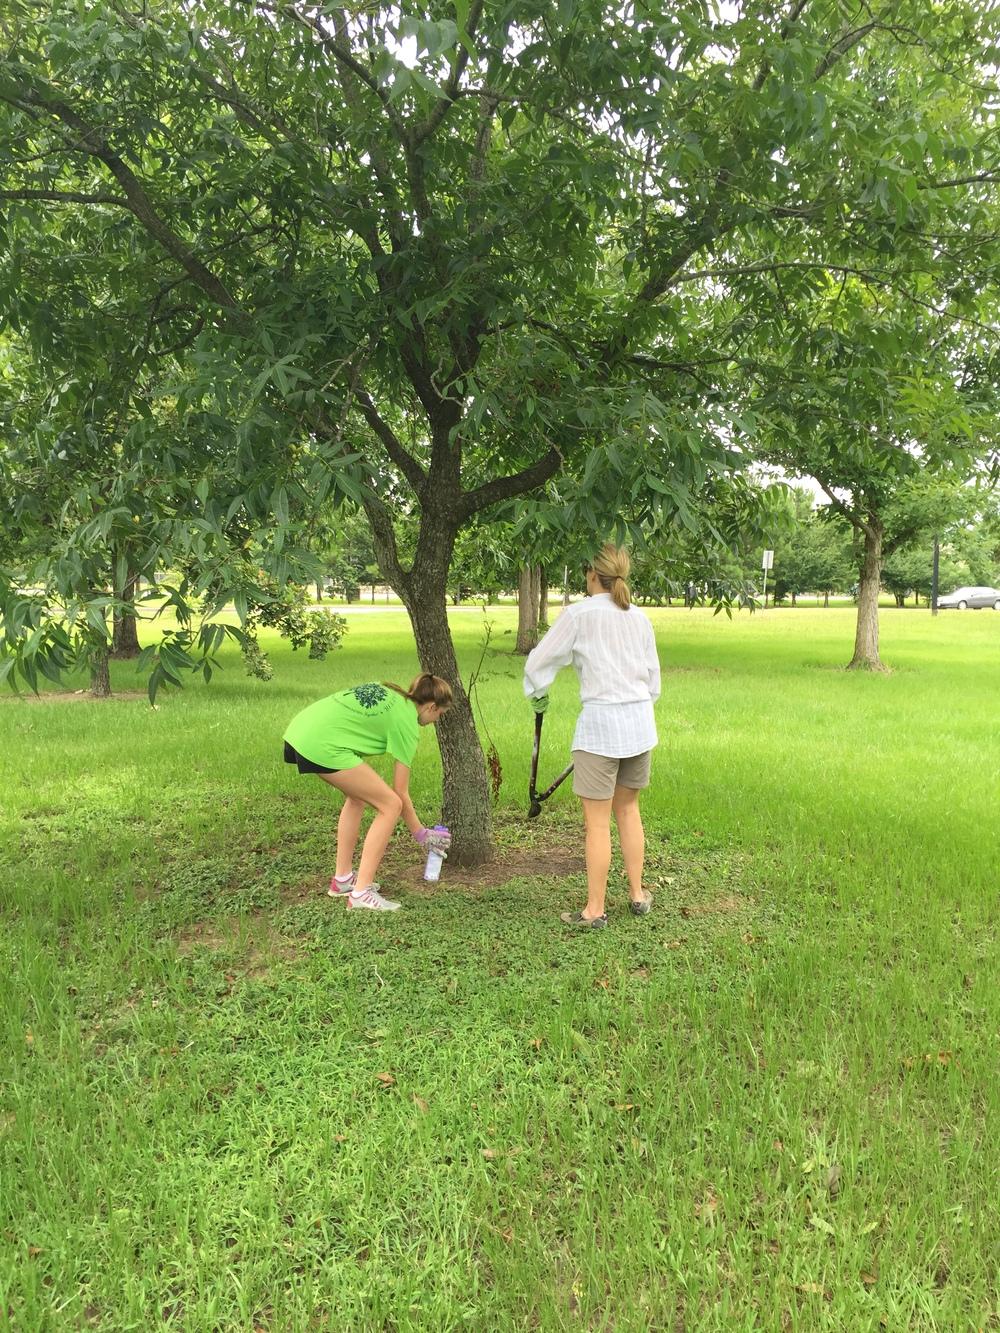 009_Memorial Park Triangle_06.15.2015.JPG